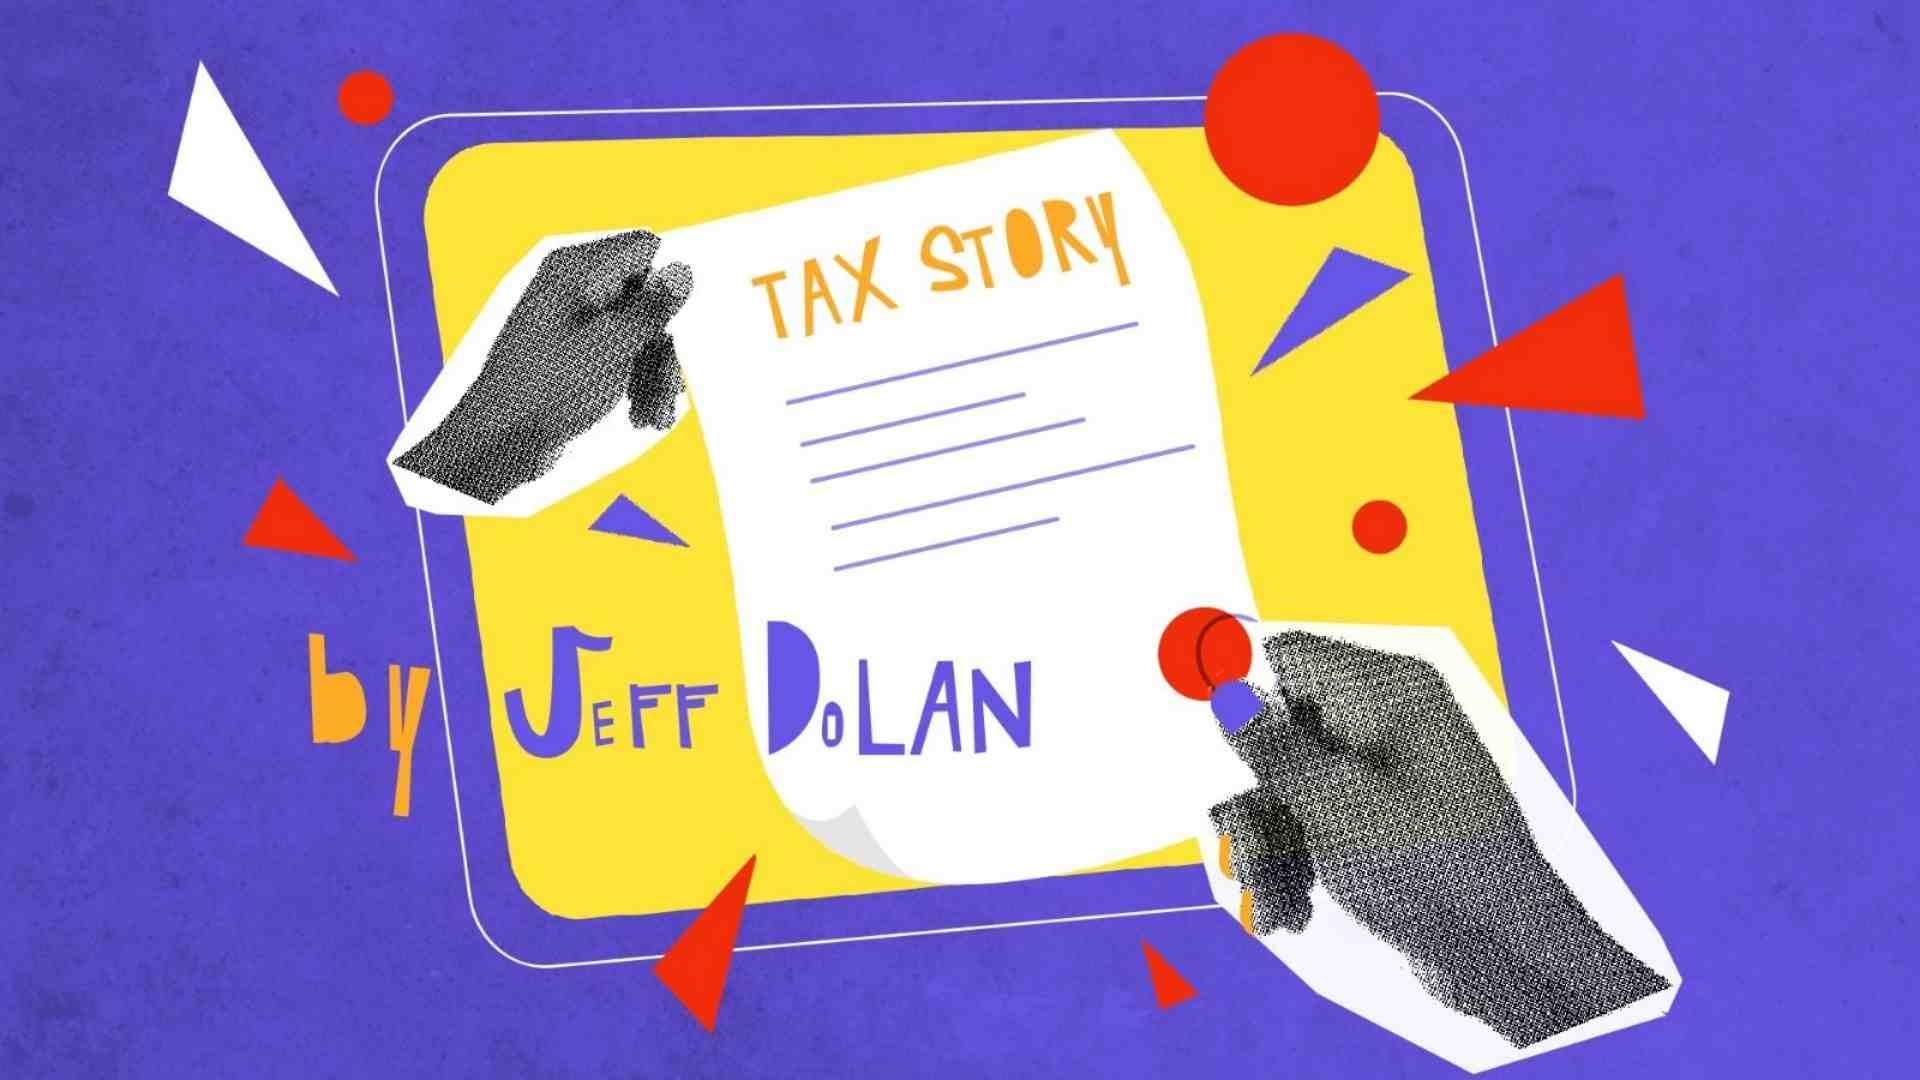 Tax story by Jeff Dolan